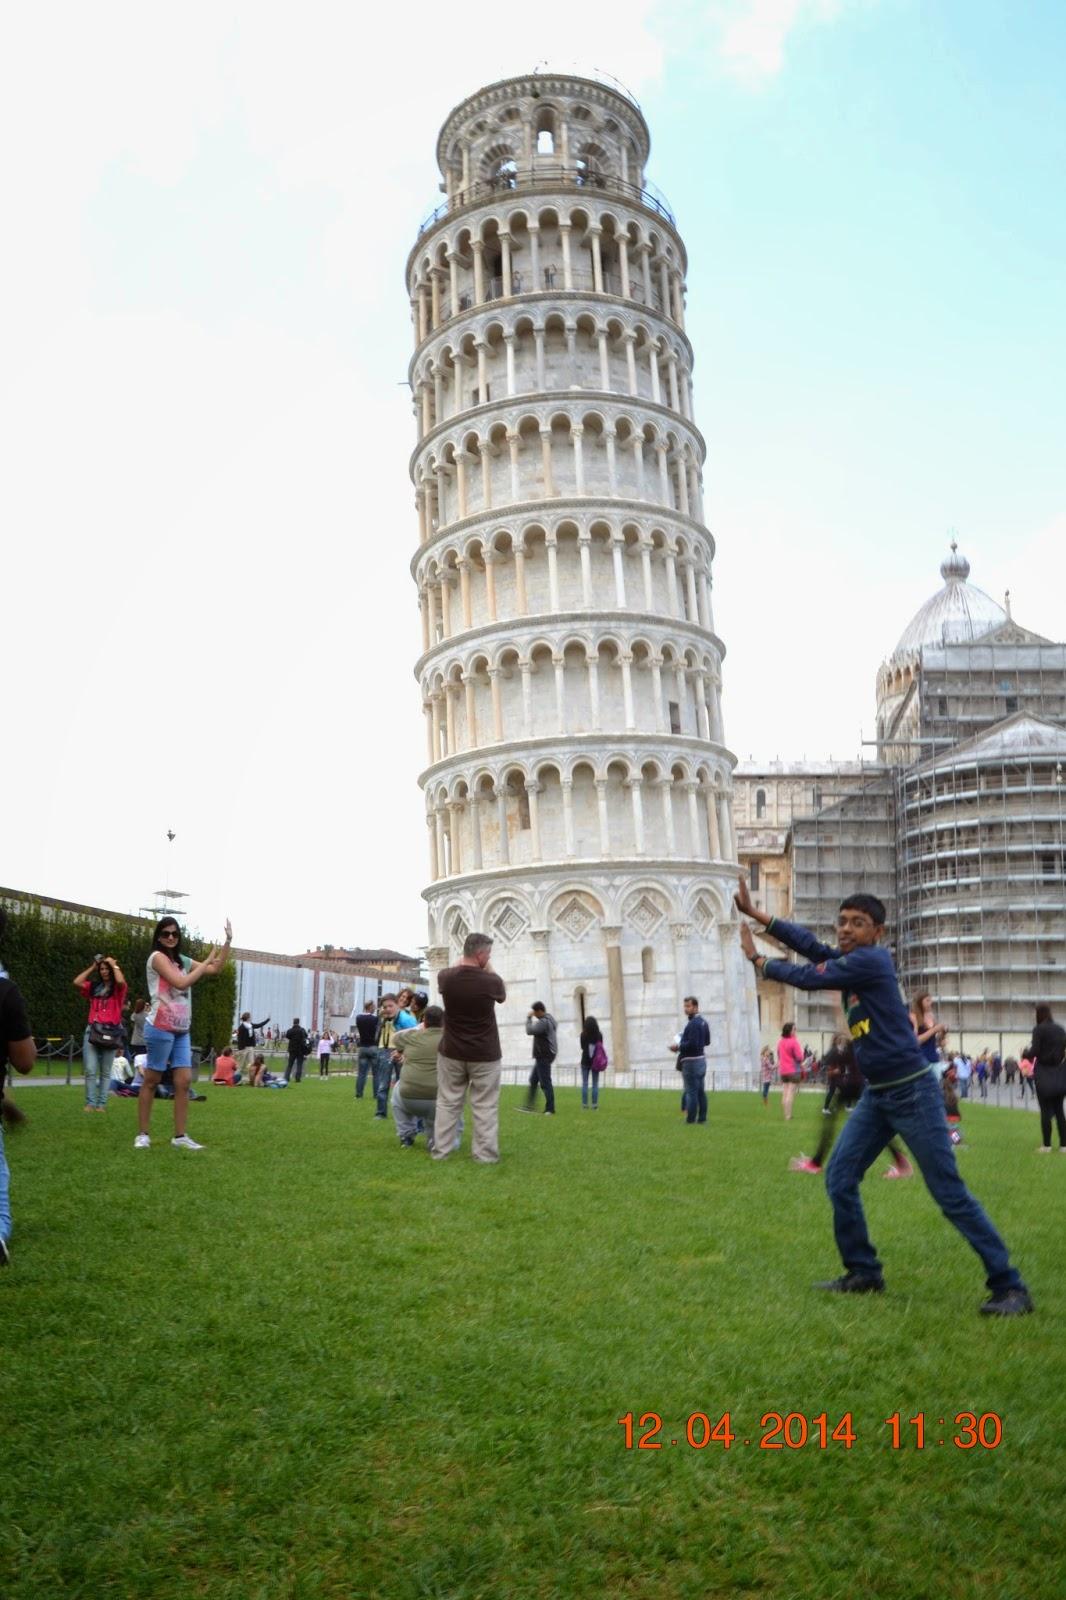 Photoshoot @ Pisa